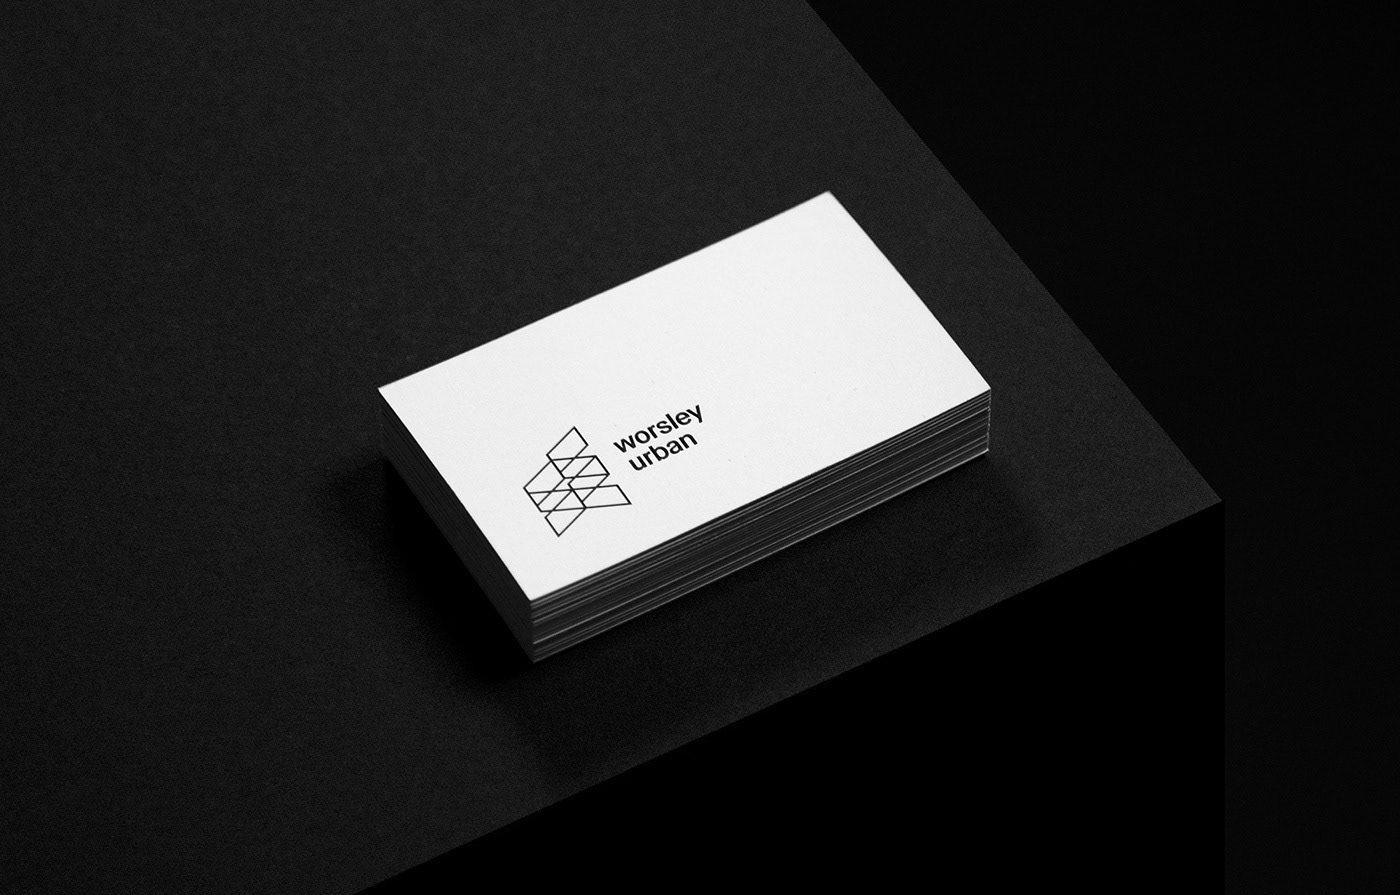 Pin By Joseph Gruenthal On New Avenue Luxury Graphic Design Logo Design Inspiration Branding Design